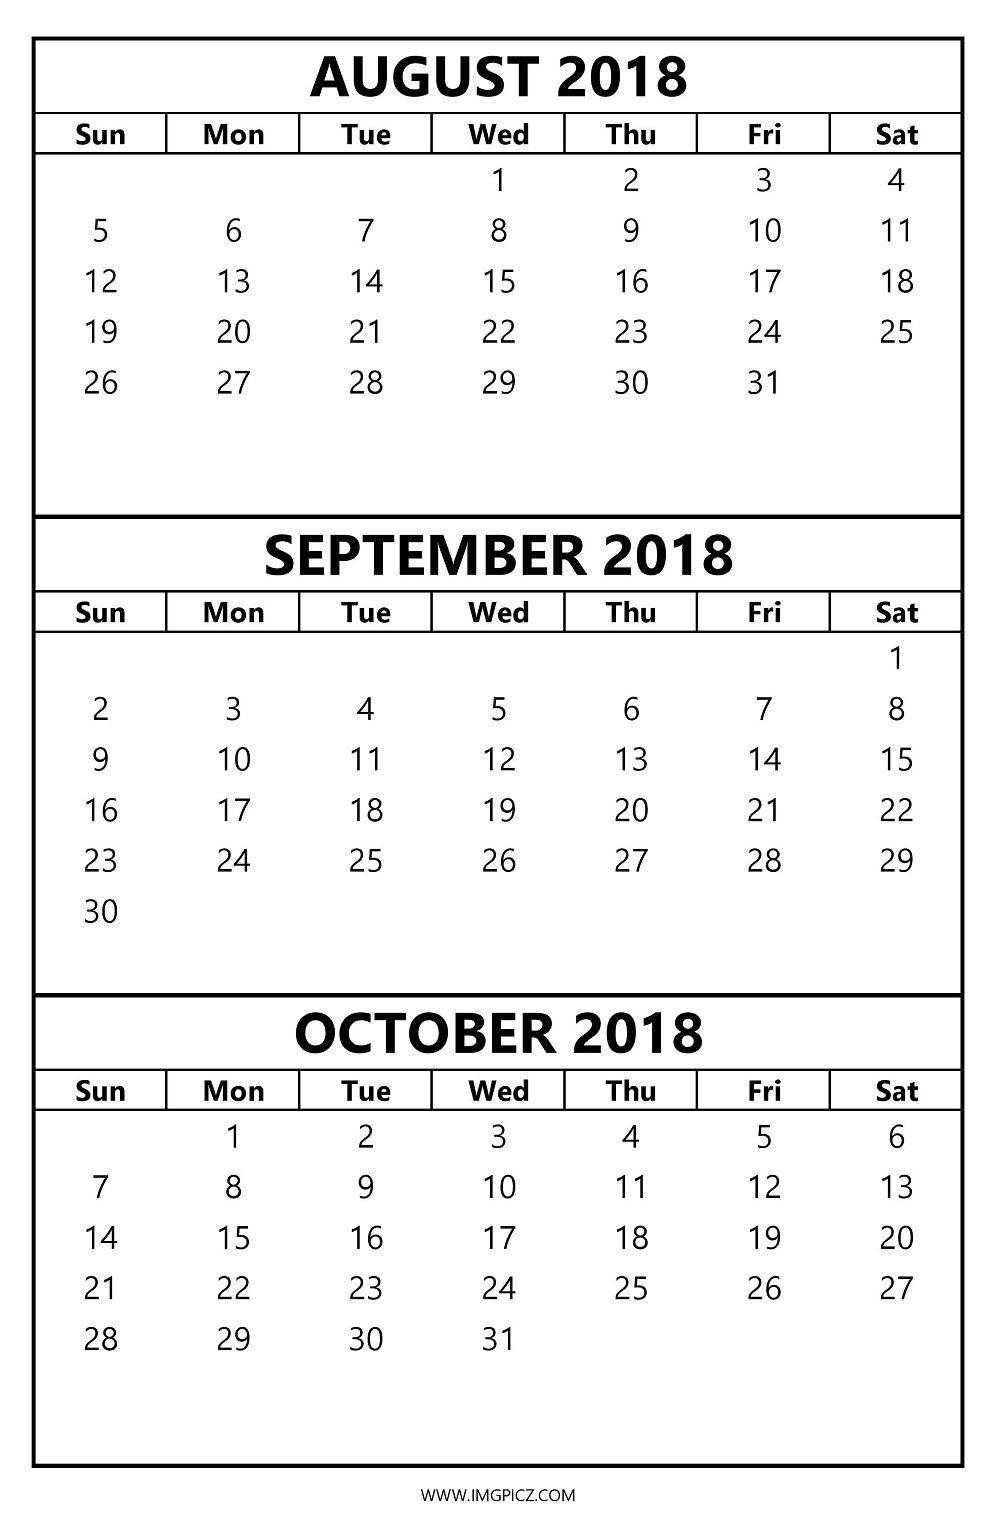 October Calendar 2018 Printable : Calendar august september october printable template